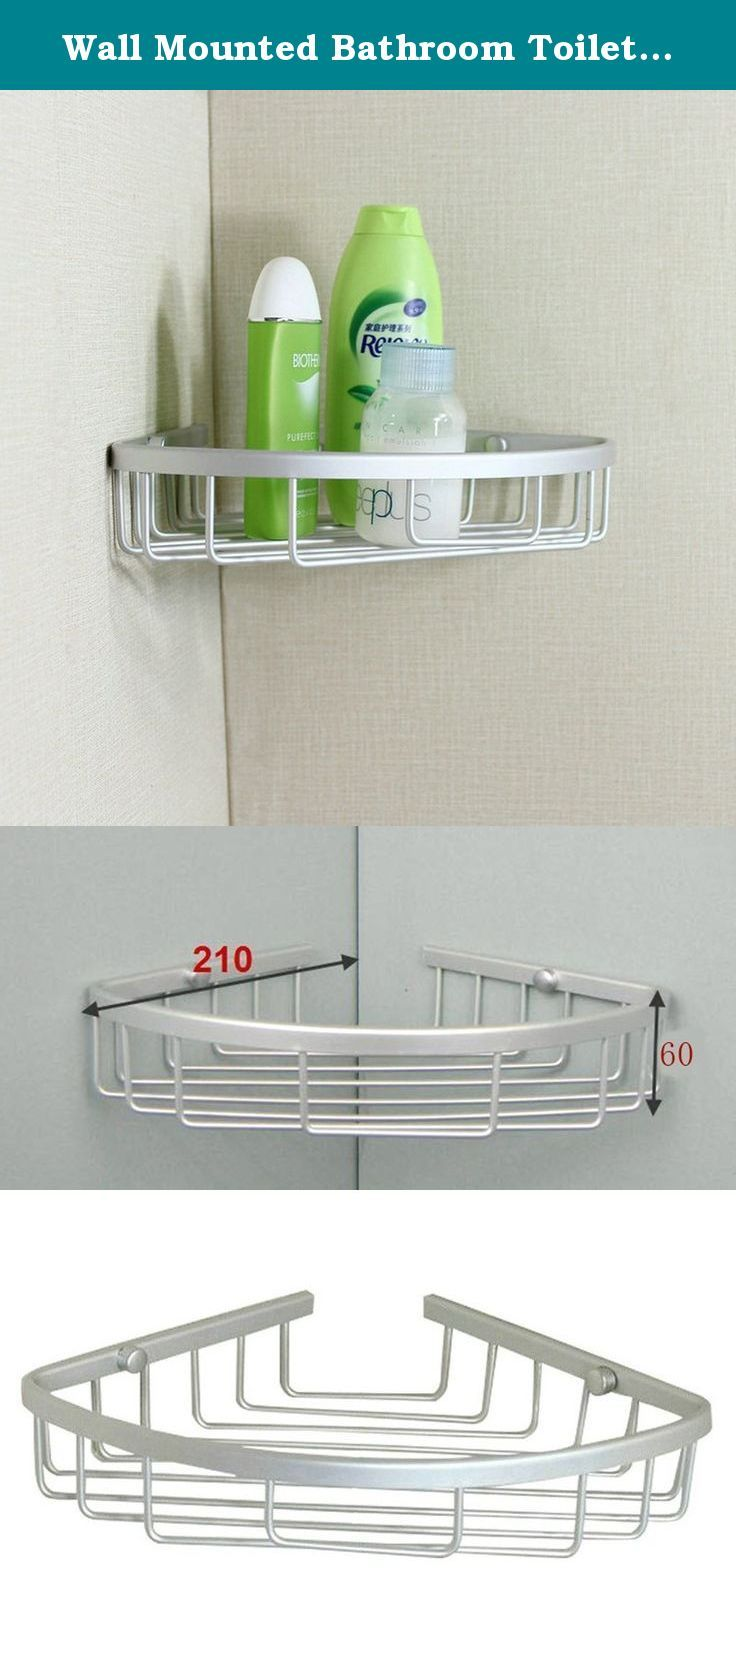 Wall Mounted Bathroom Toilet Corner Shelf Rack Storage Organizer Basket Spacesaver Maximize Your Bathroom S S Bathroom Tray Bathroom Accessories Shower Basket